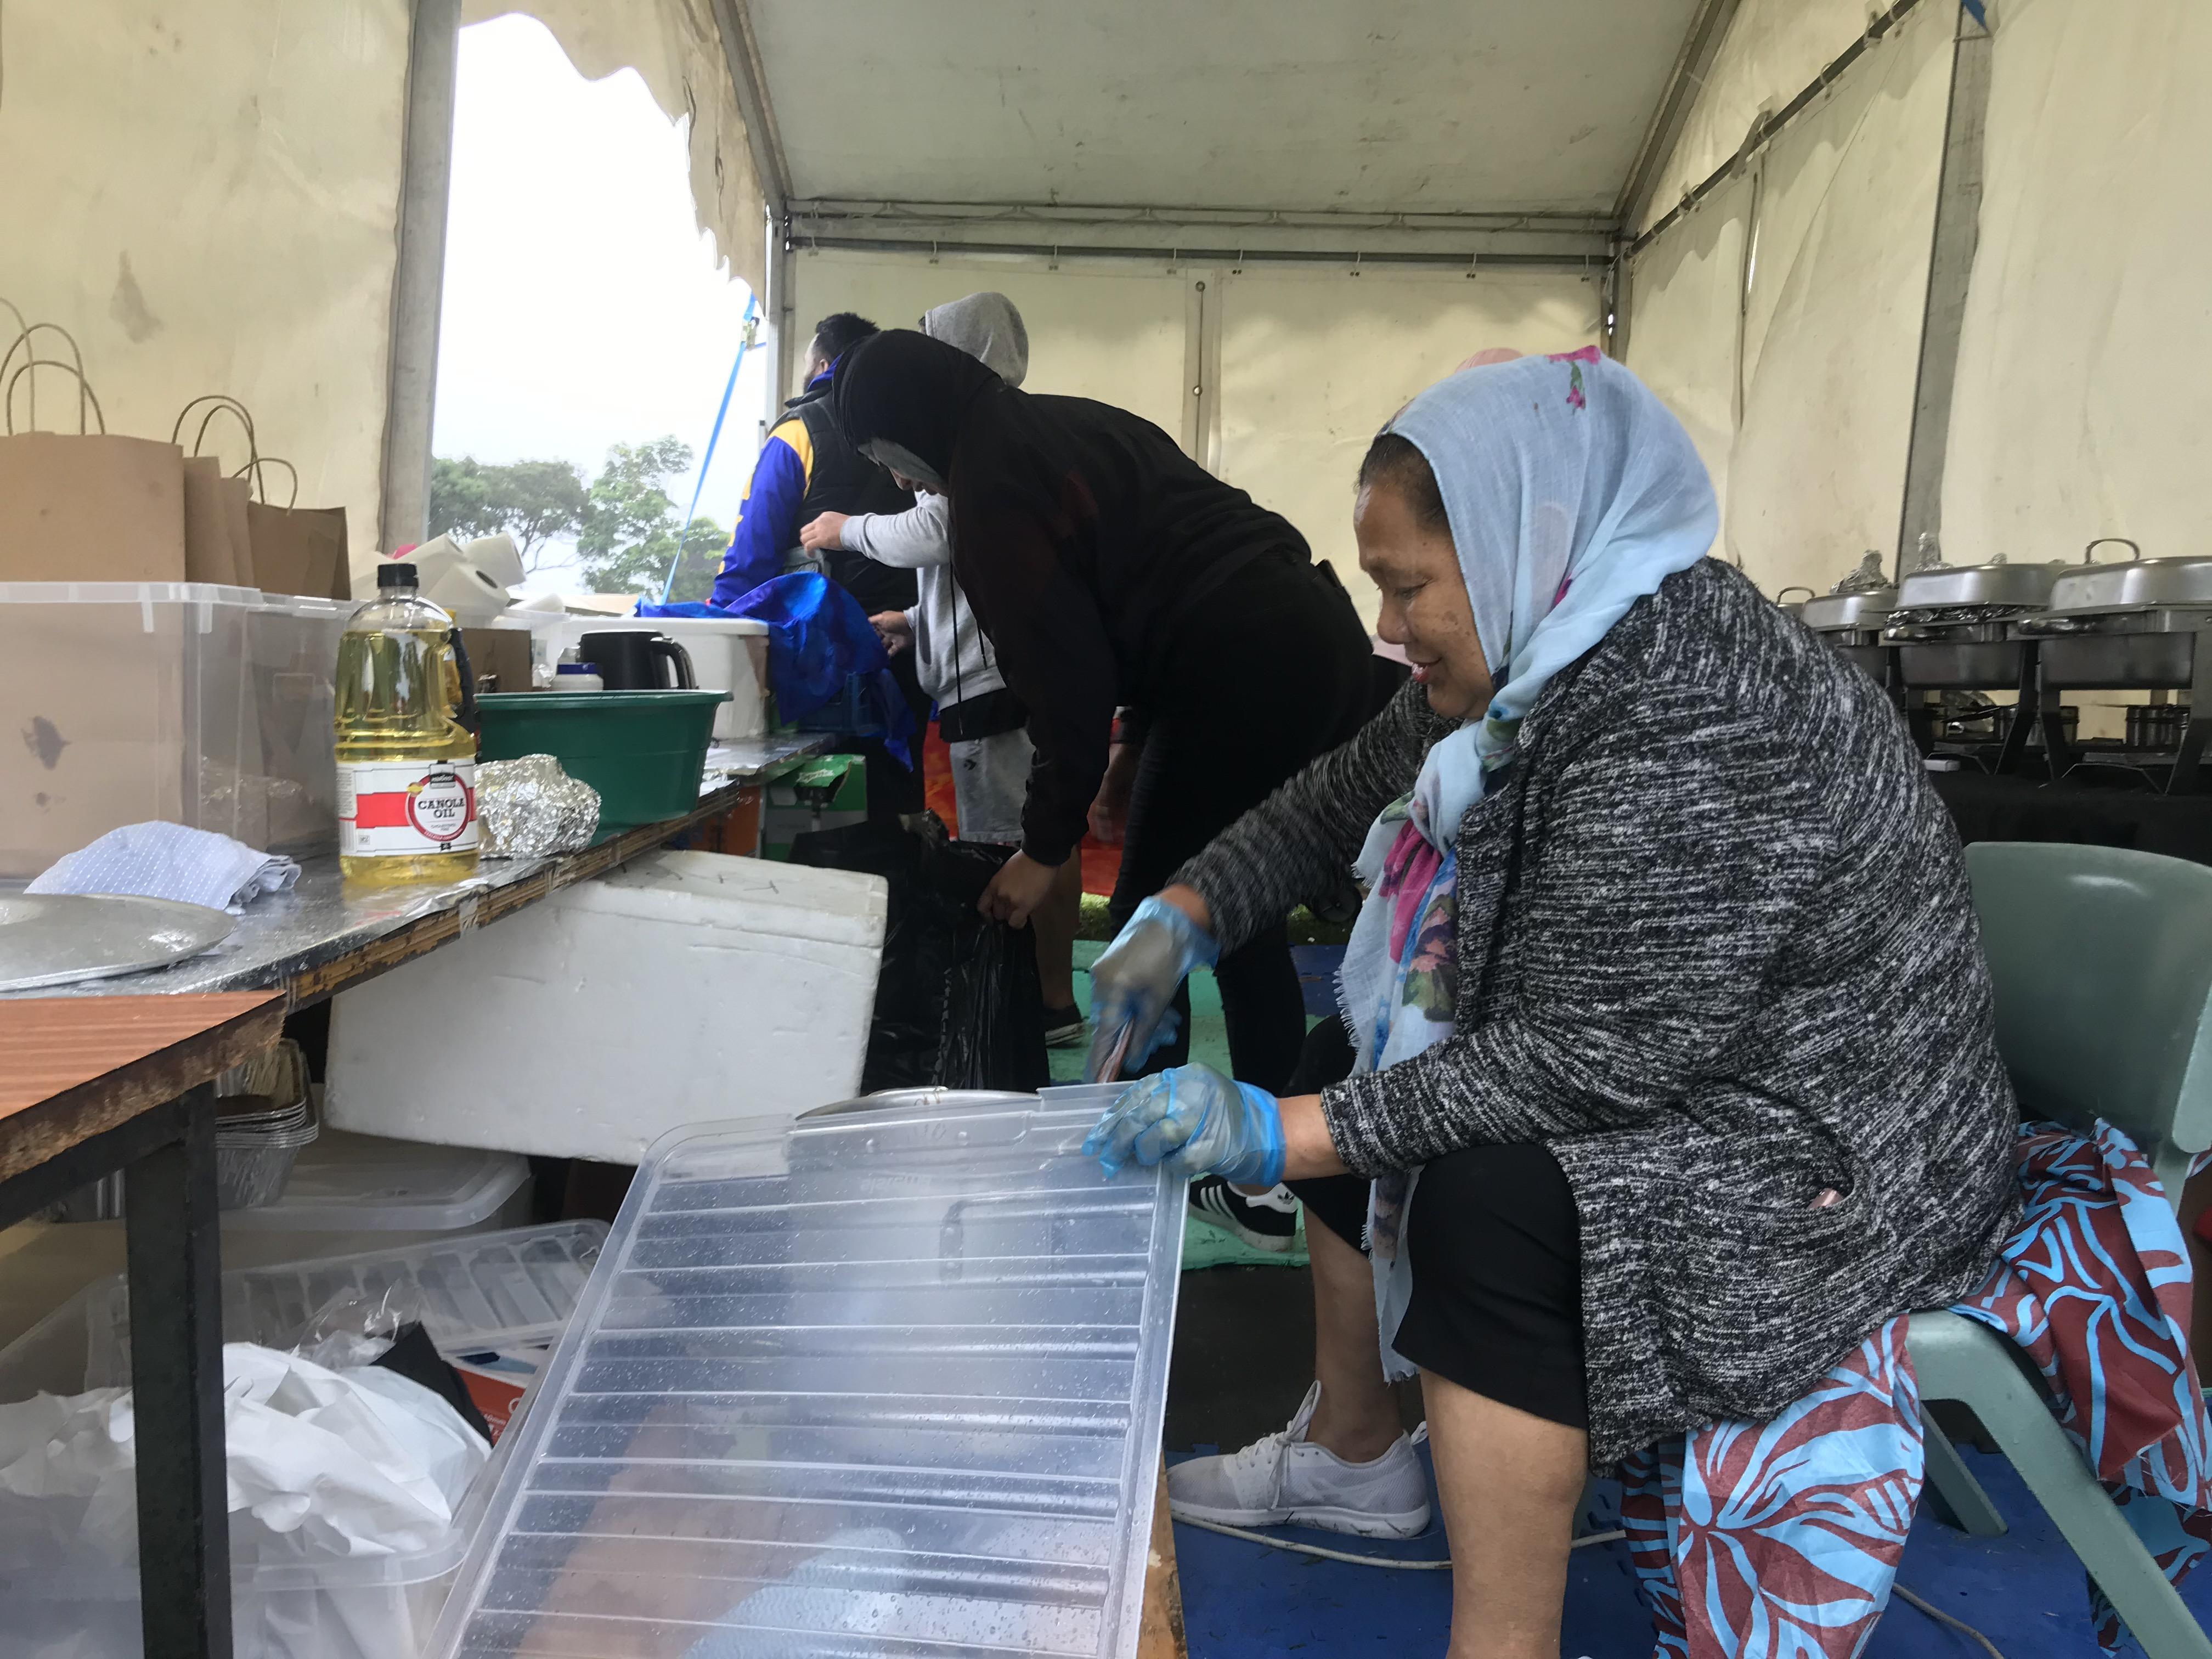 Michael Kapisi's (in background) family prepare their Niuean dishes for Pasifika festival attendees